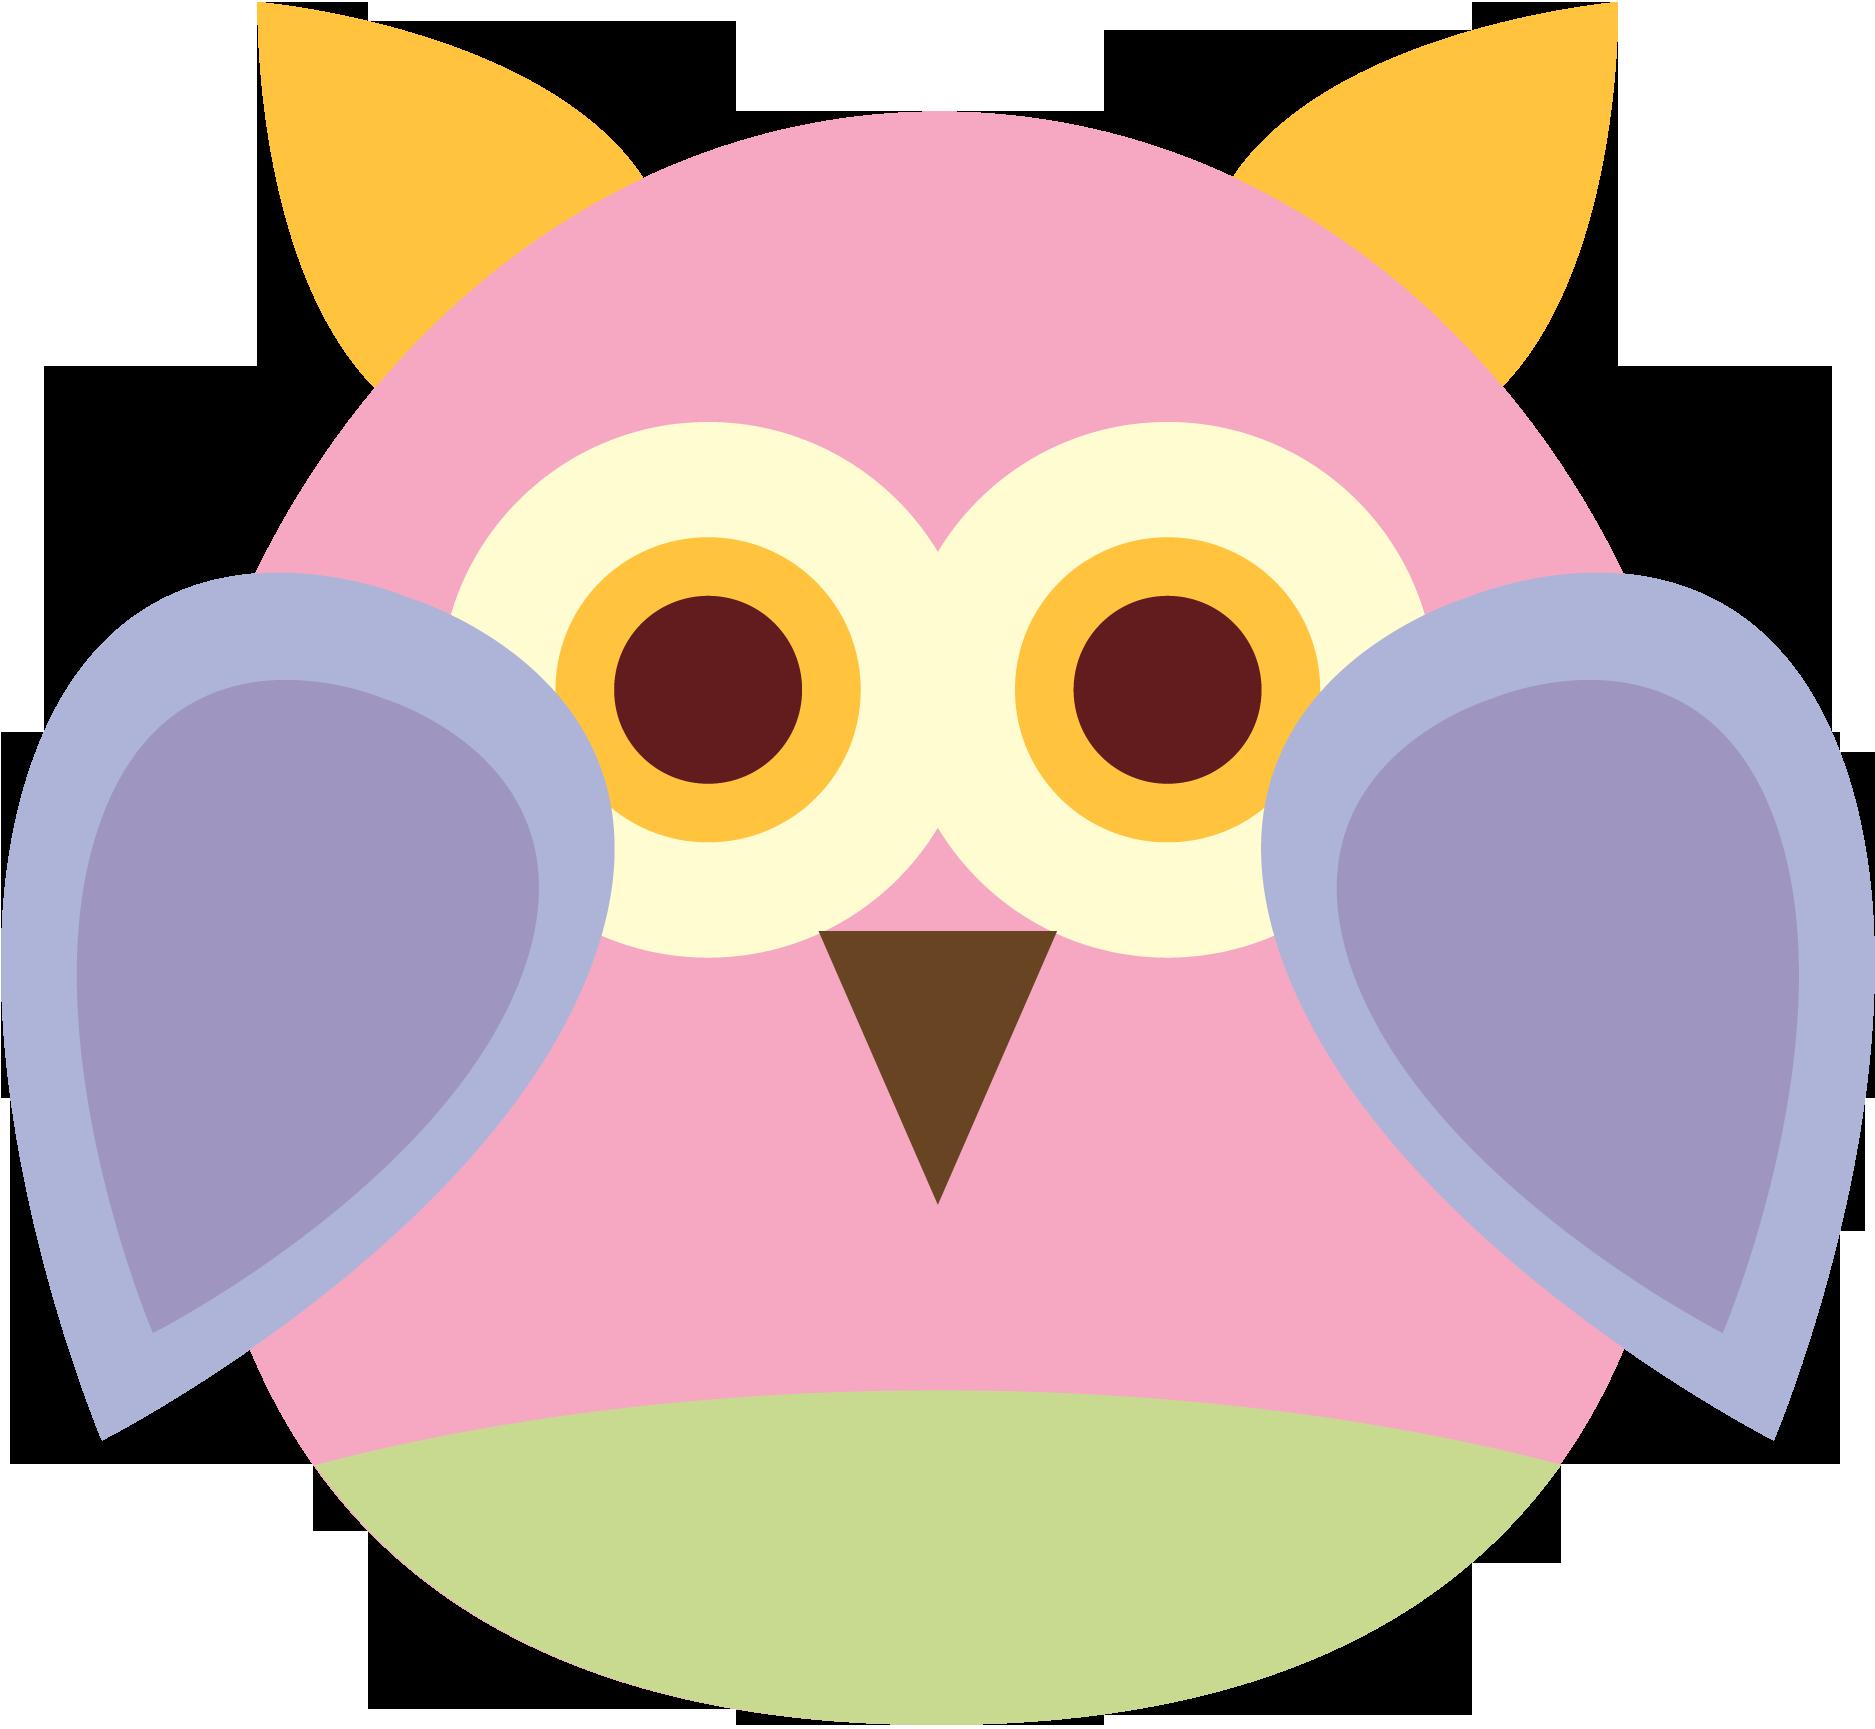 Thank You Owl Clip Art   Clipart Library-Thank You Owl Clip Art   Clipart library - Free Clipart Images-19